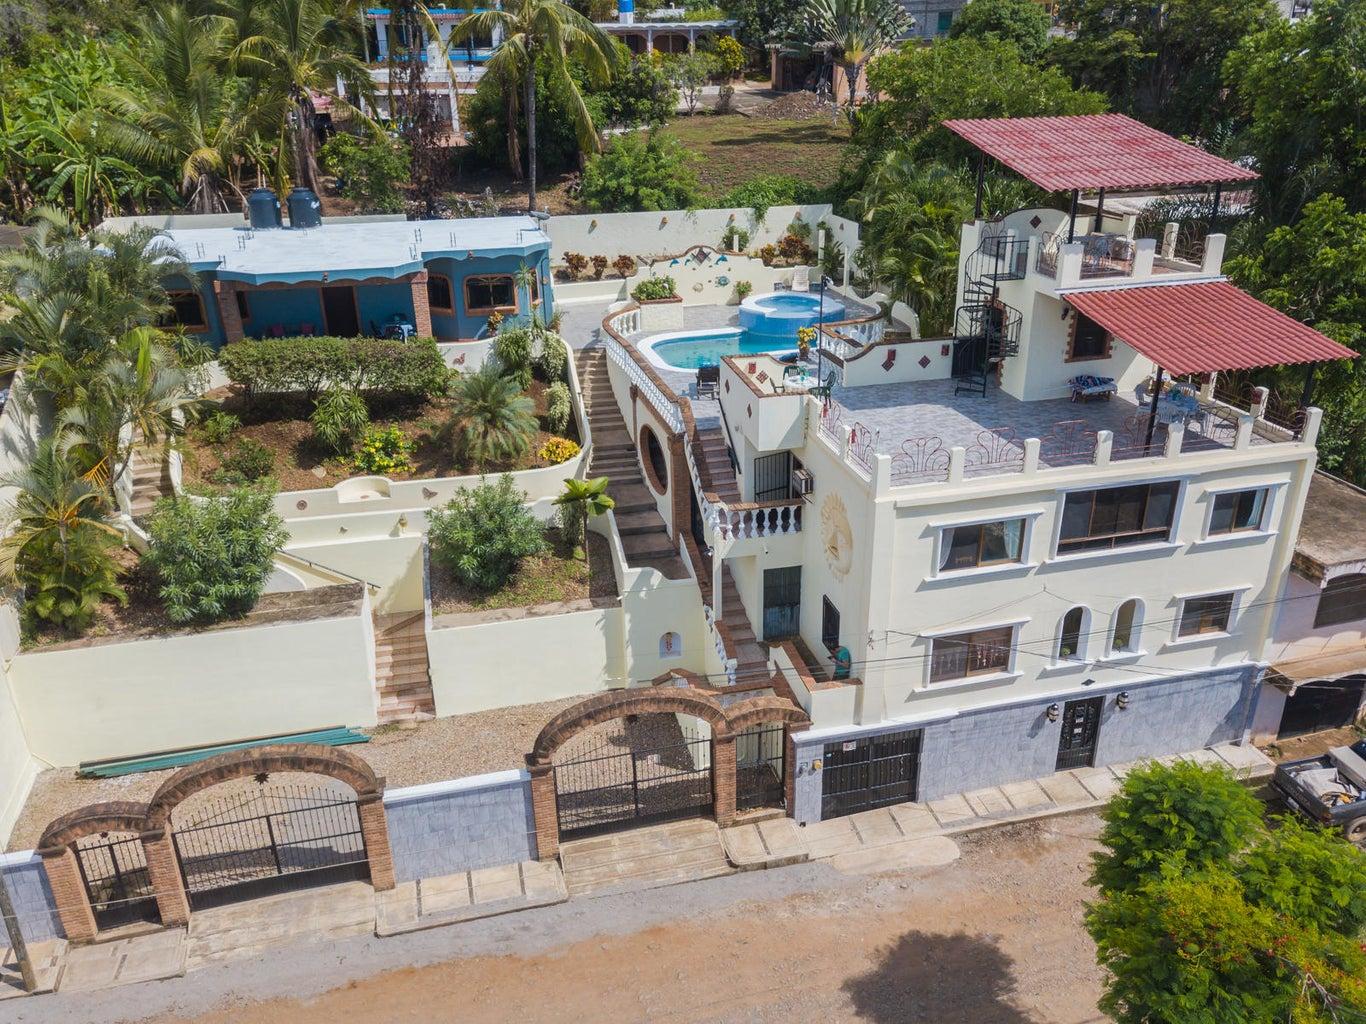 Casa guayabitos_webres_drone-9